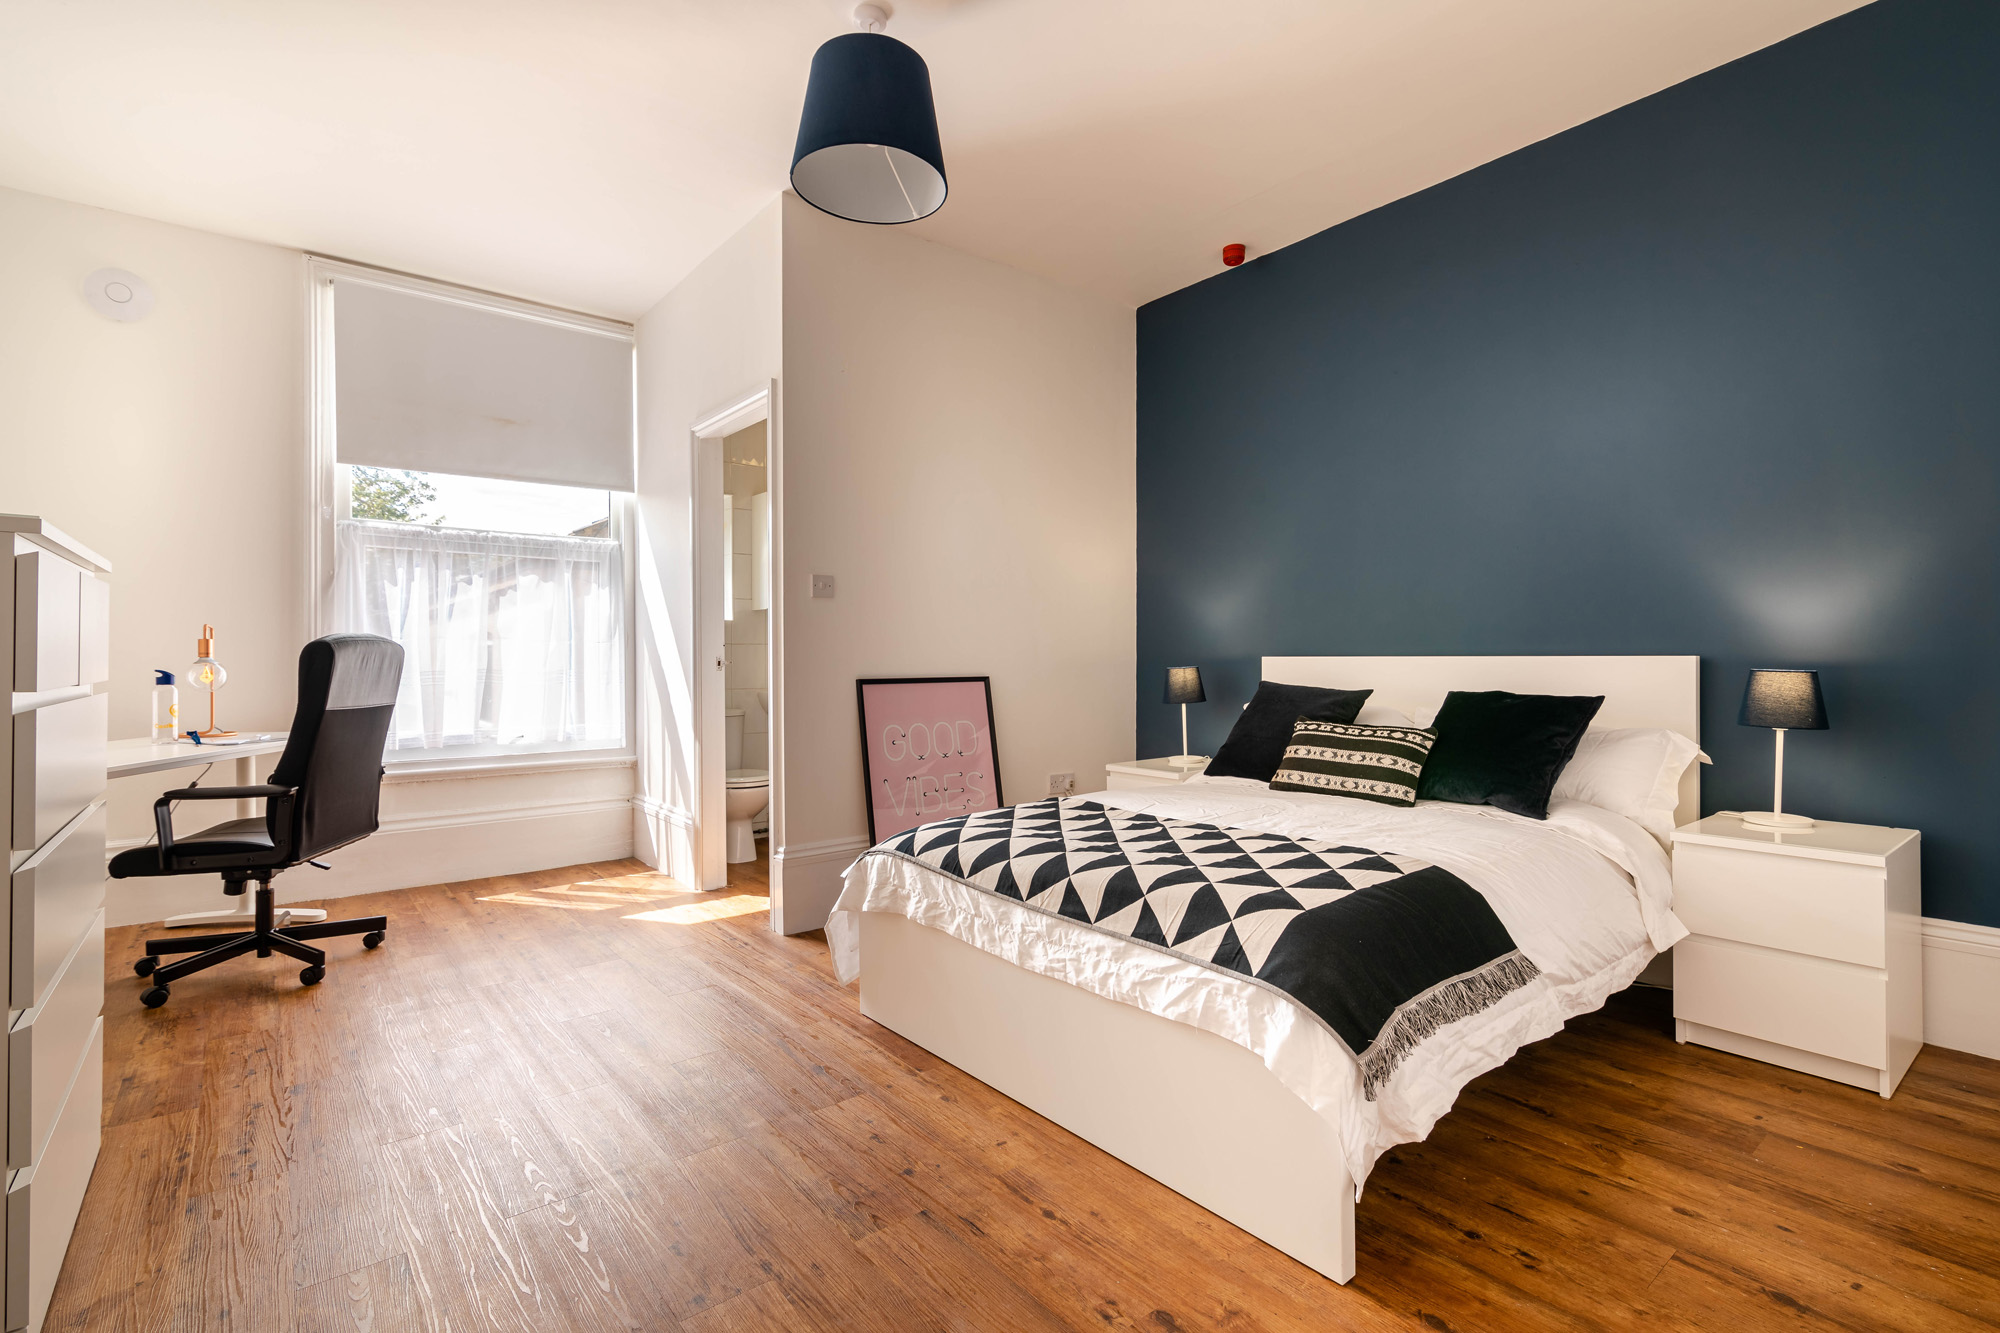 student flats hull, student accommodation hull, student apartments hull